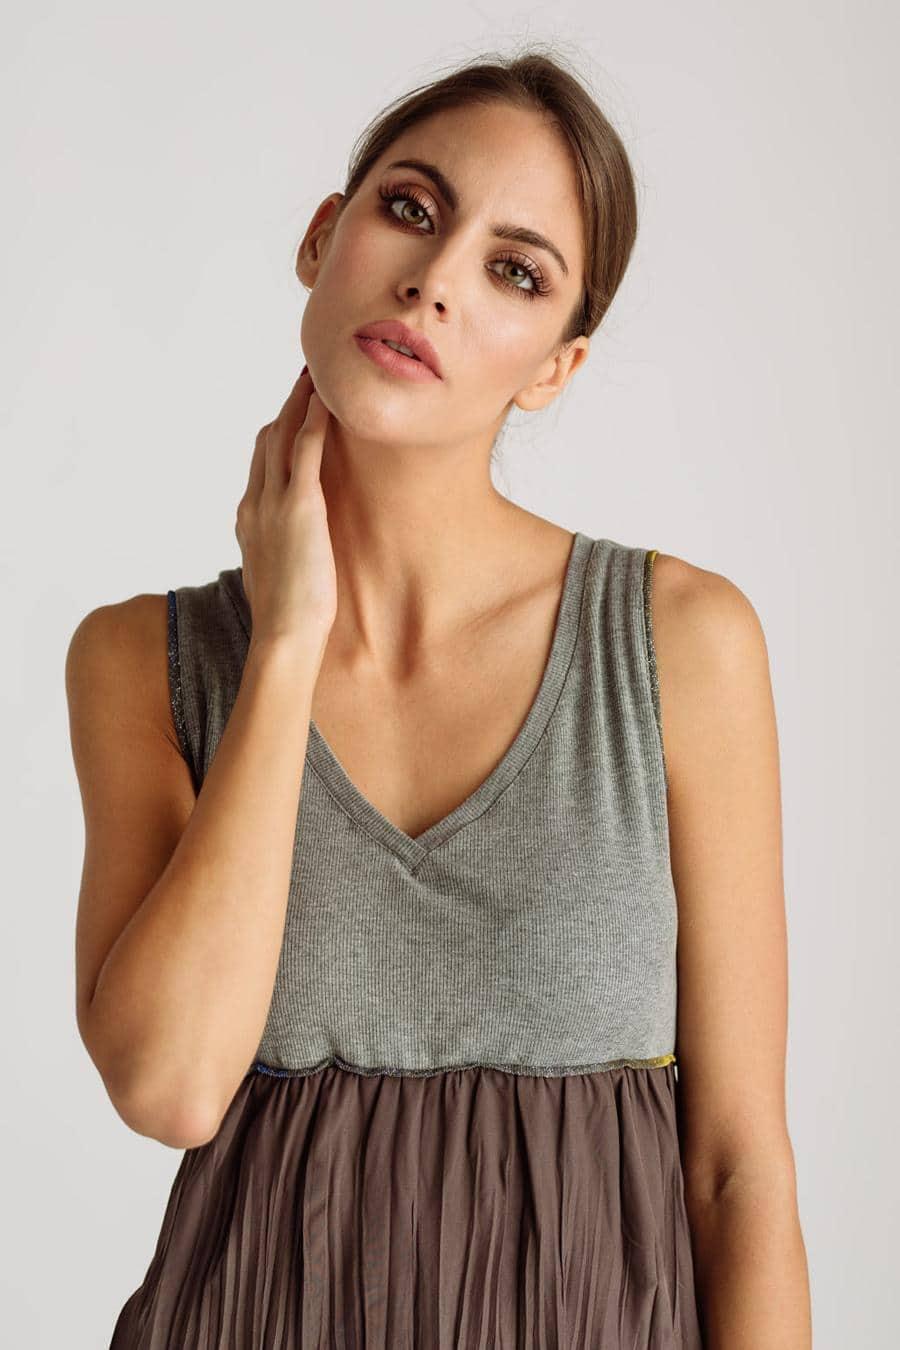 jagger zenska haljina kolekcija prolece leto 2021 ss 2021 kupi online jg 5488 05 3